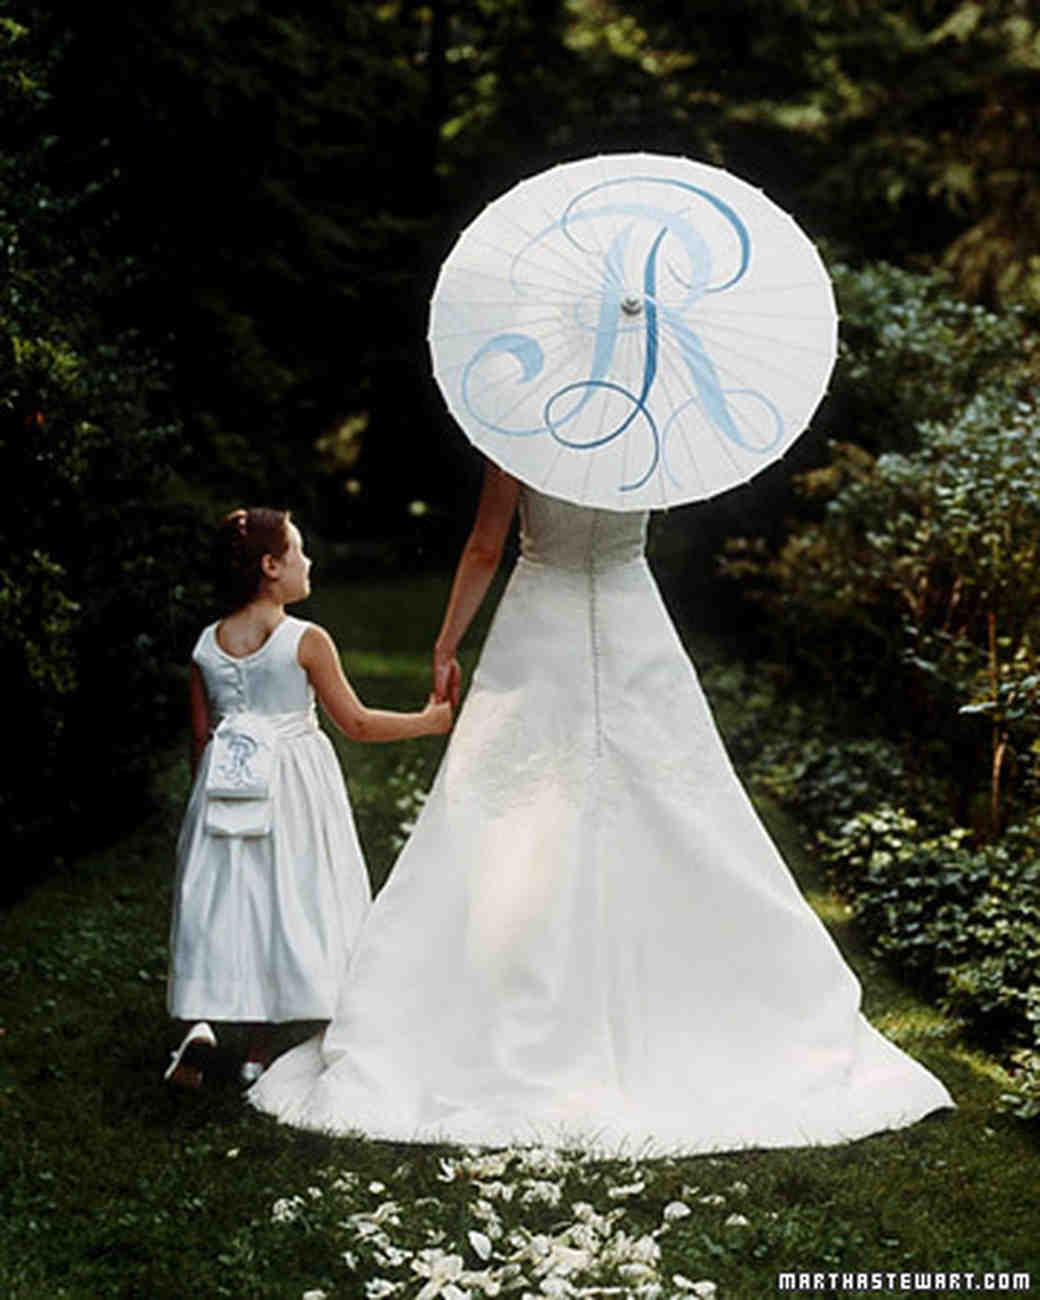 Martha Stewart Weddings: Summer Weddings: An Outdoor Occasion